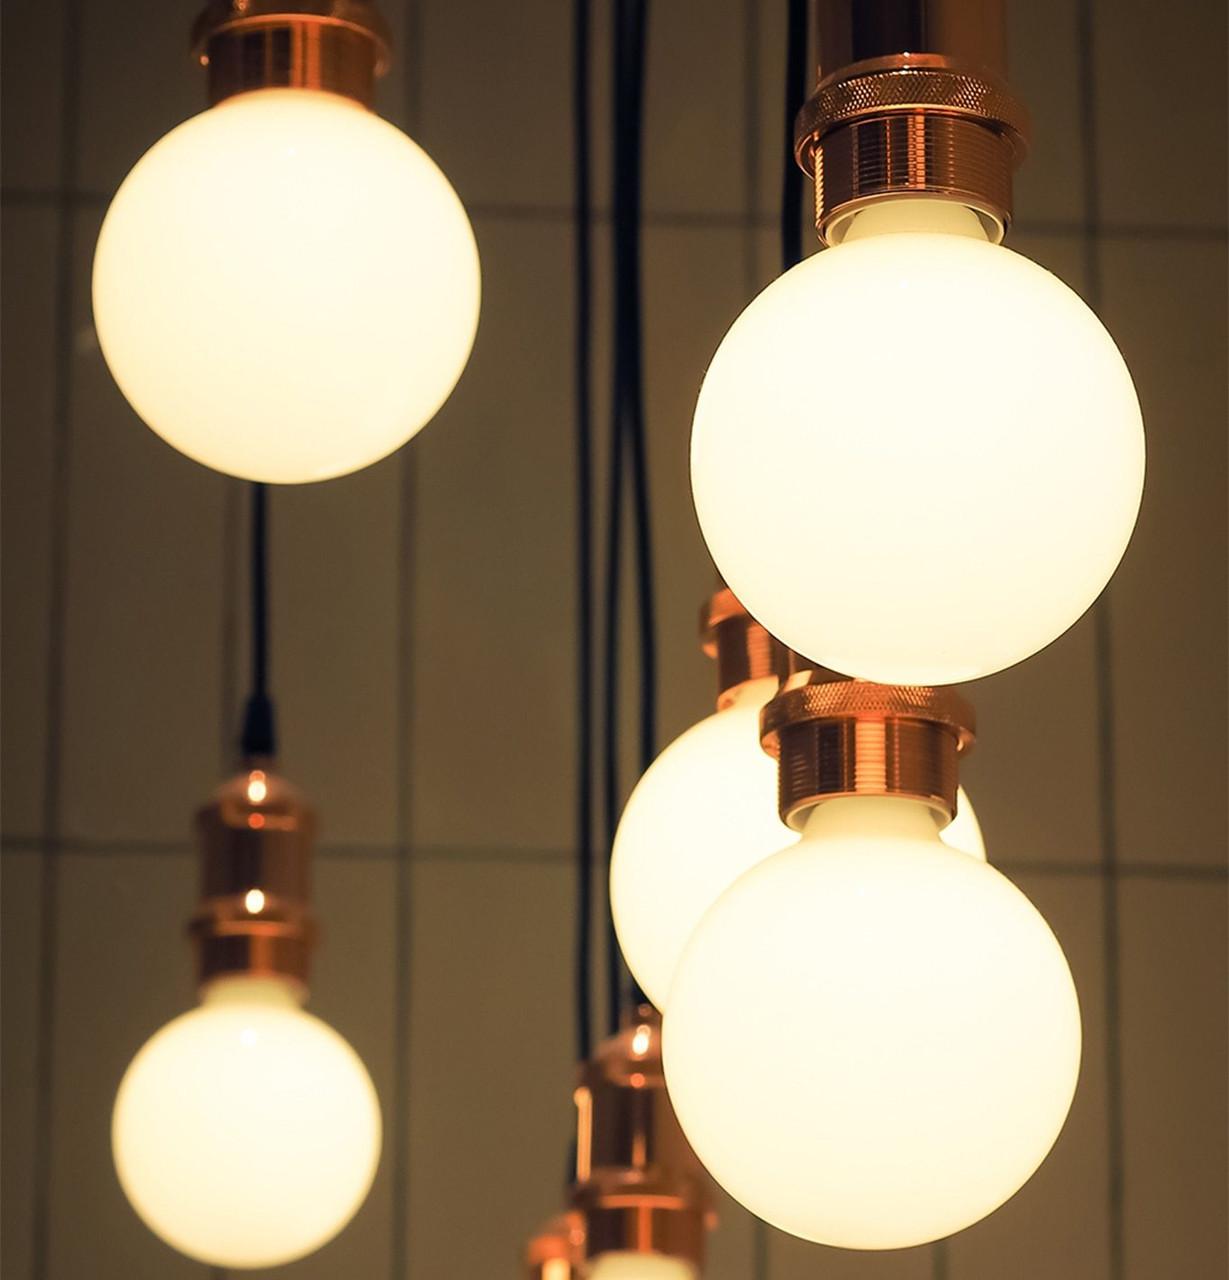 LED Dimmable Globe 2700K Light Bulbs